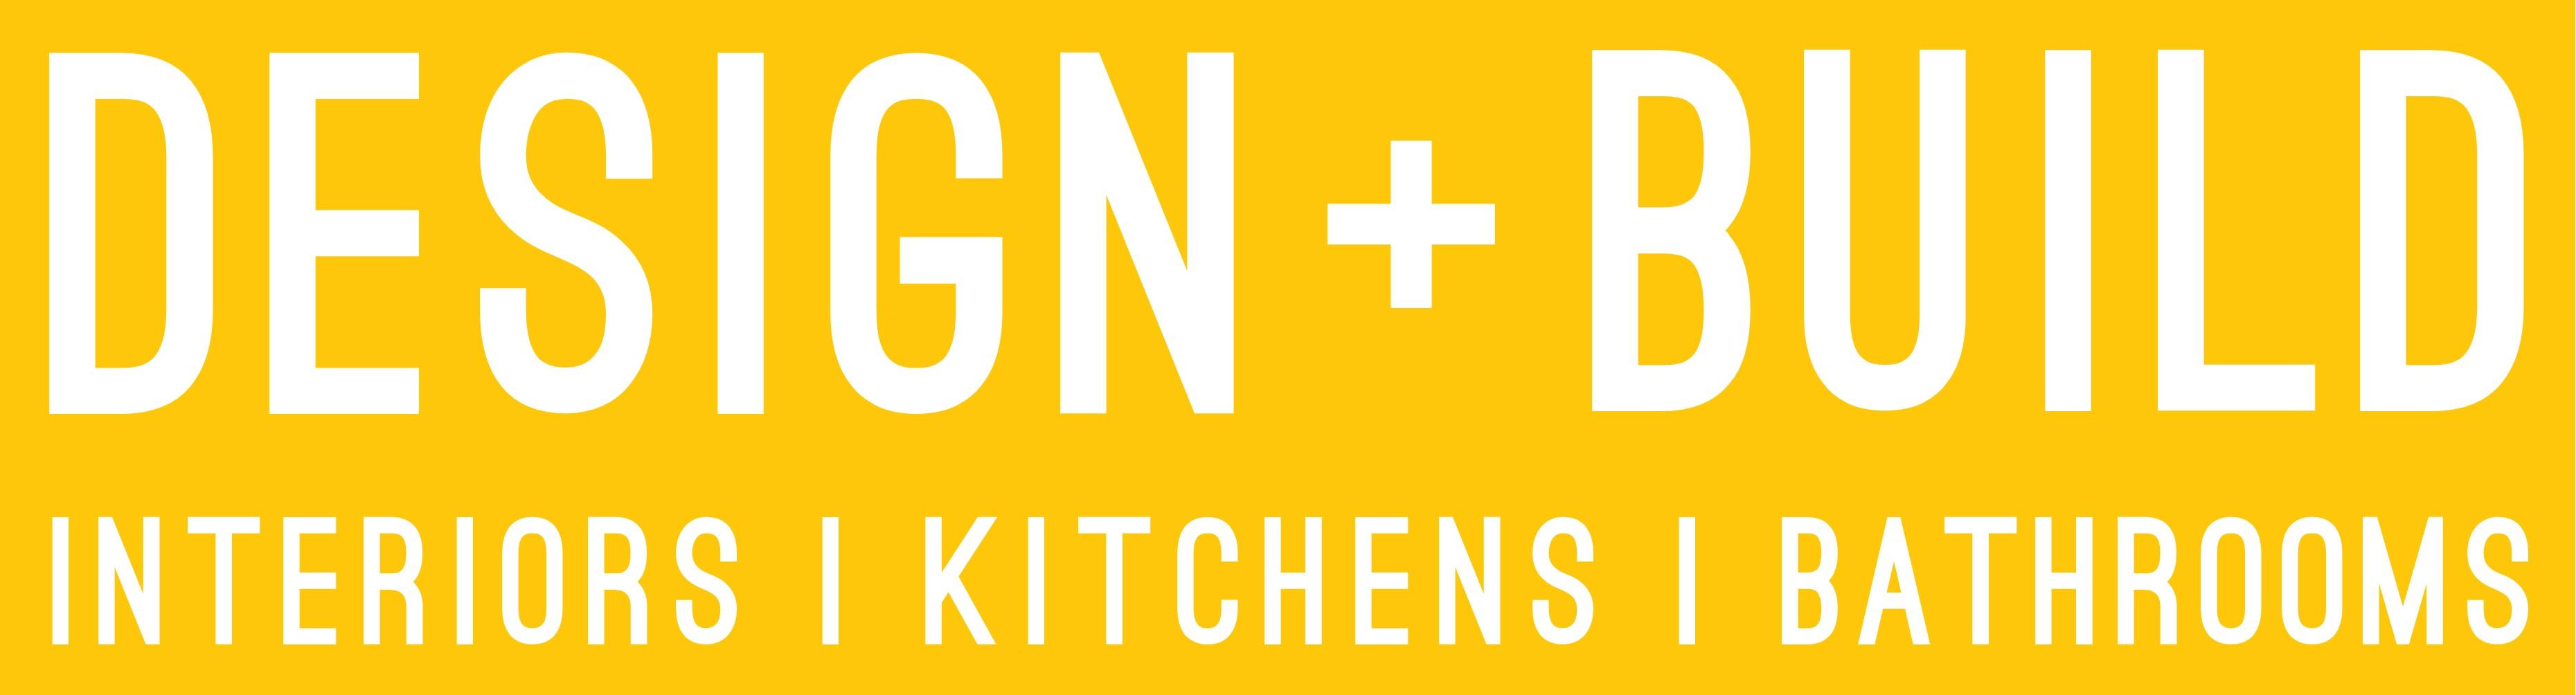 Design_interiors_kitchens_bathrooms_yellow